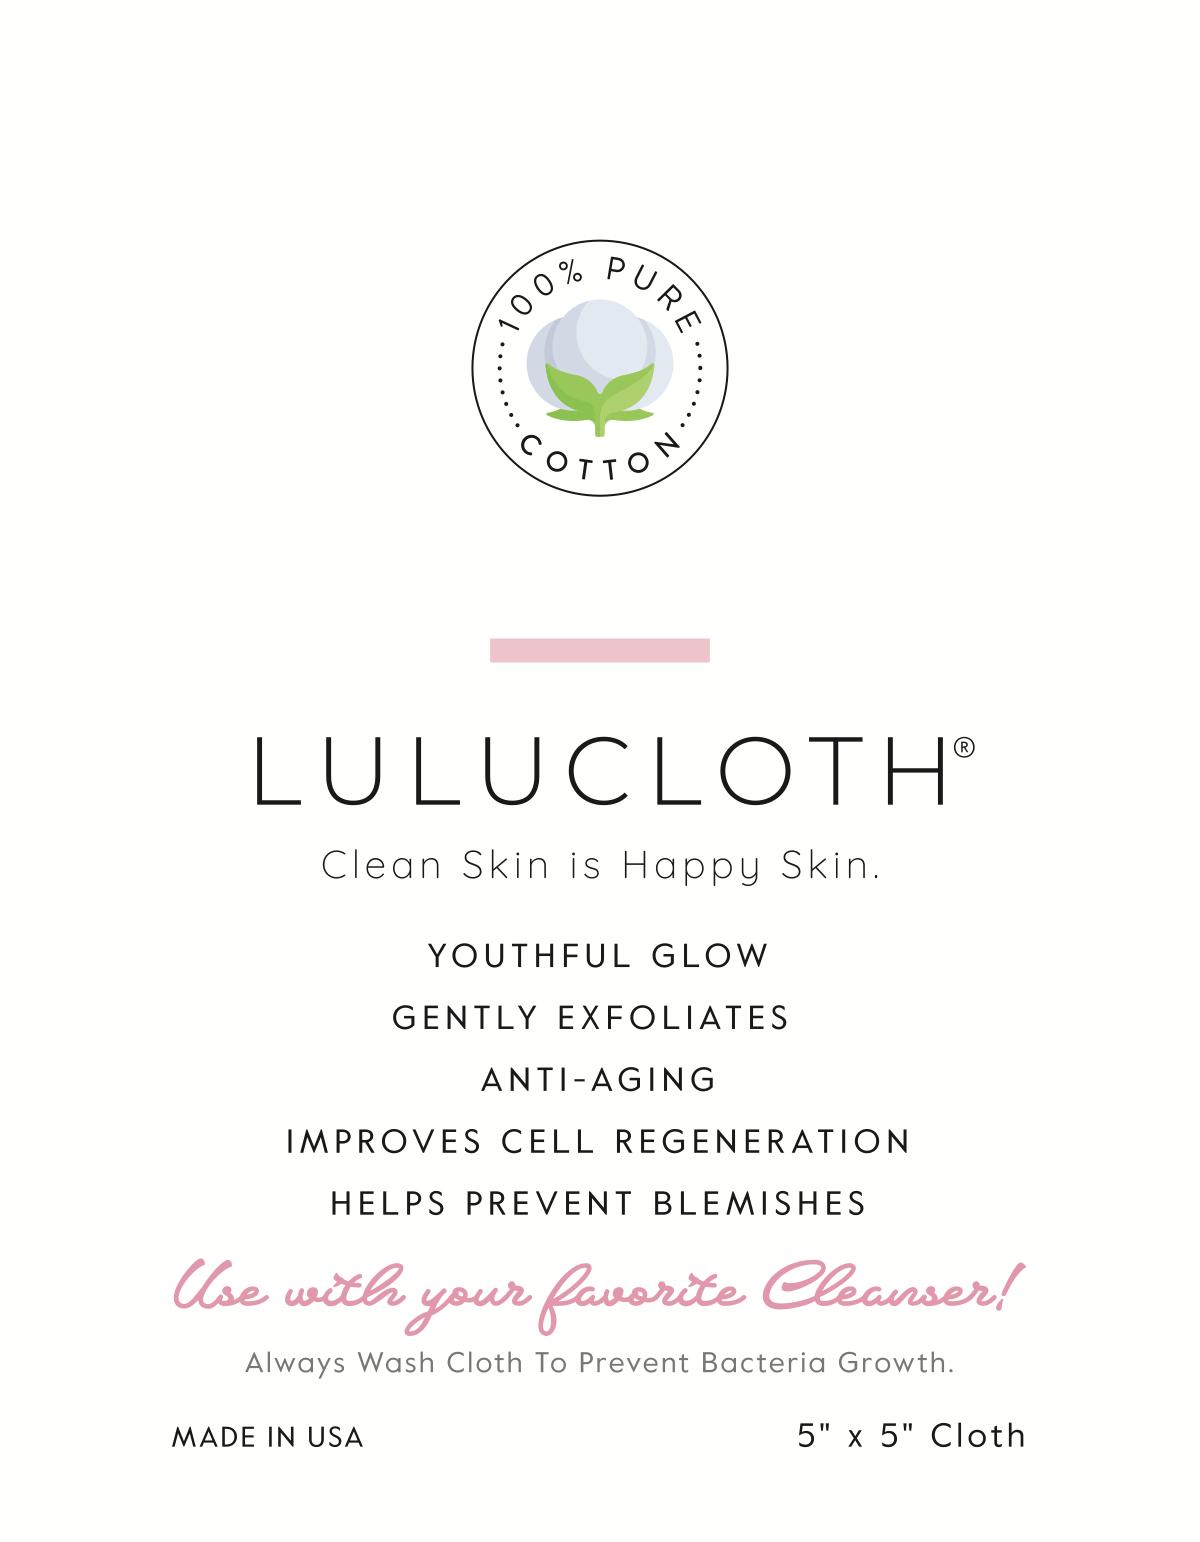 Lulucloth